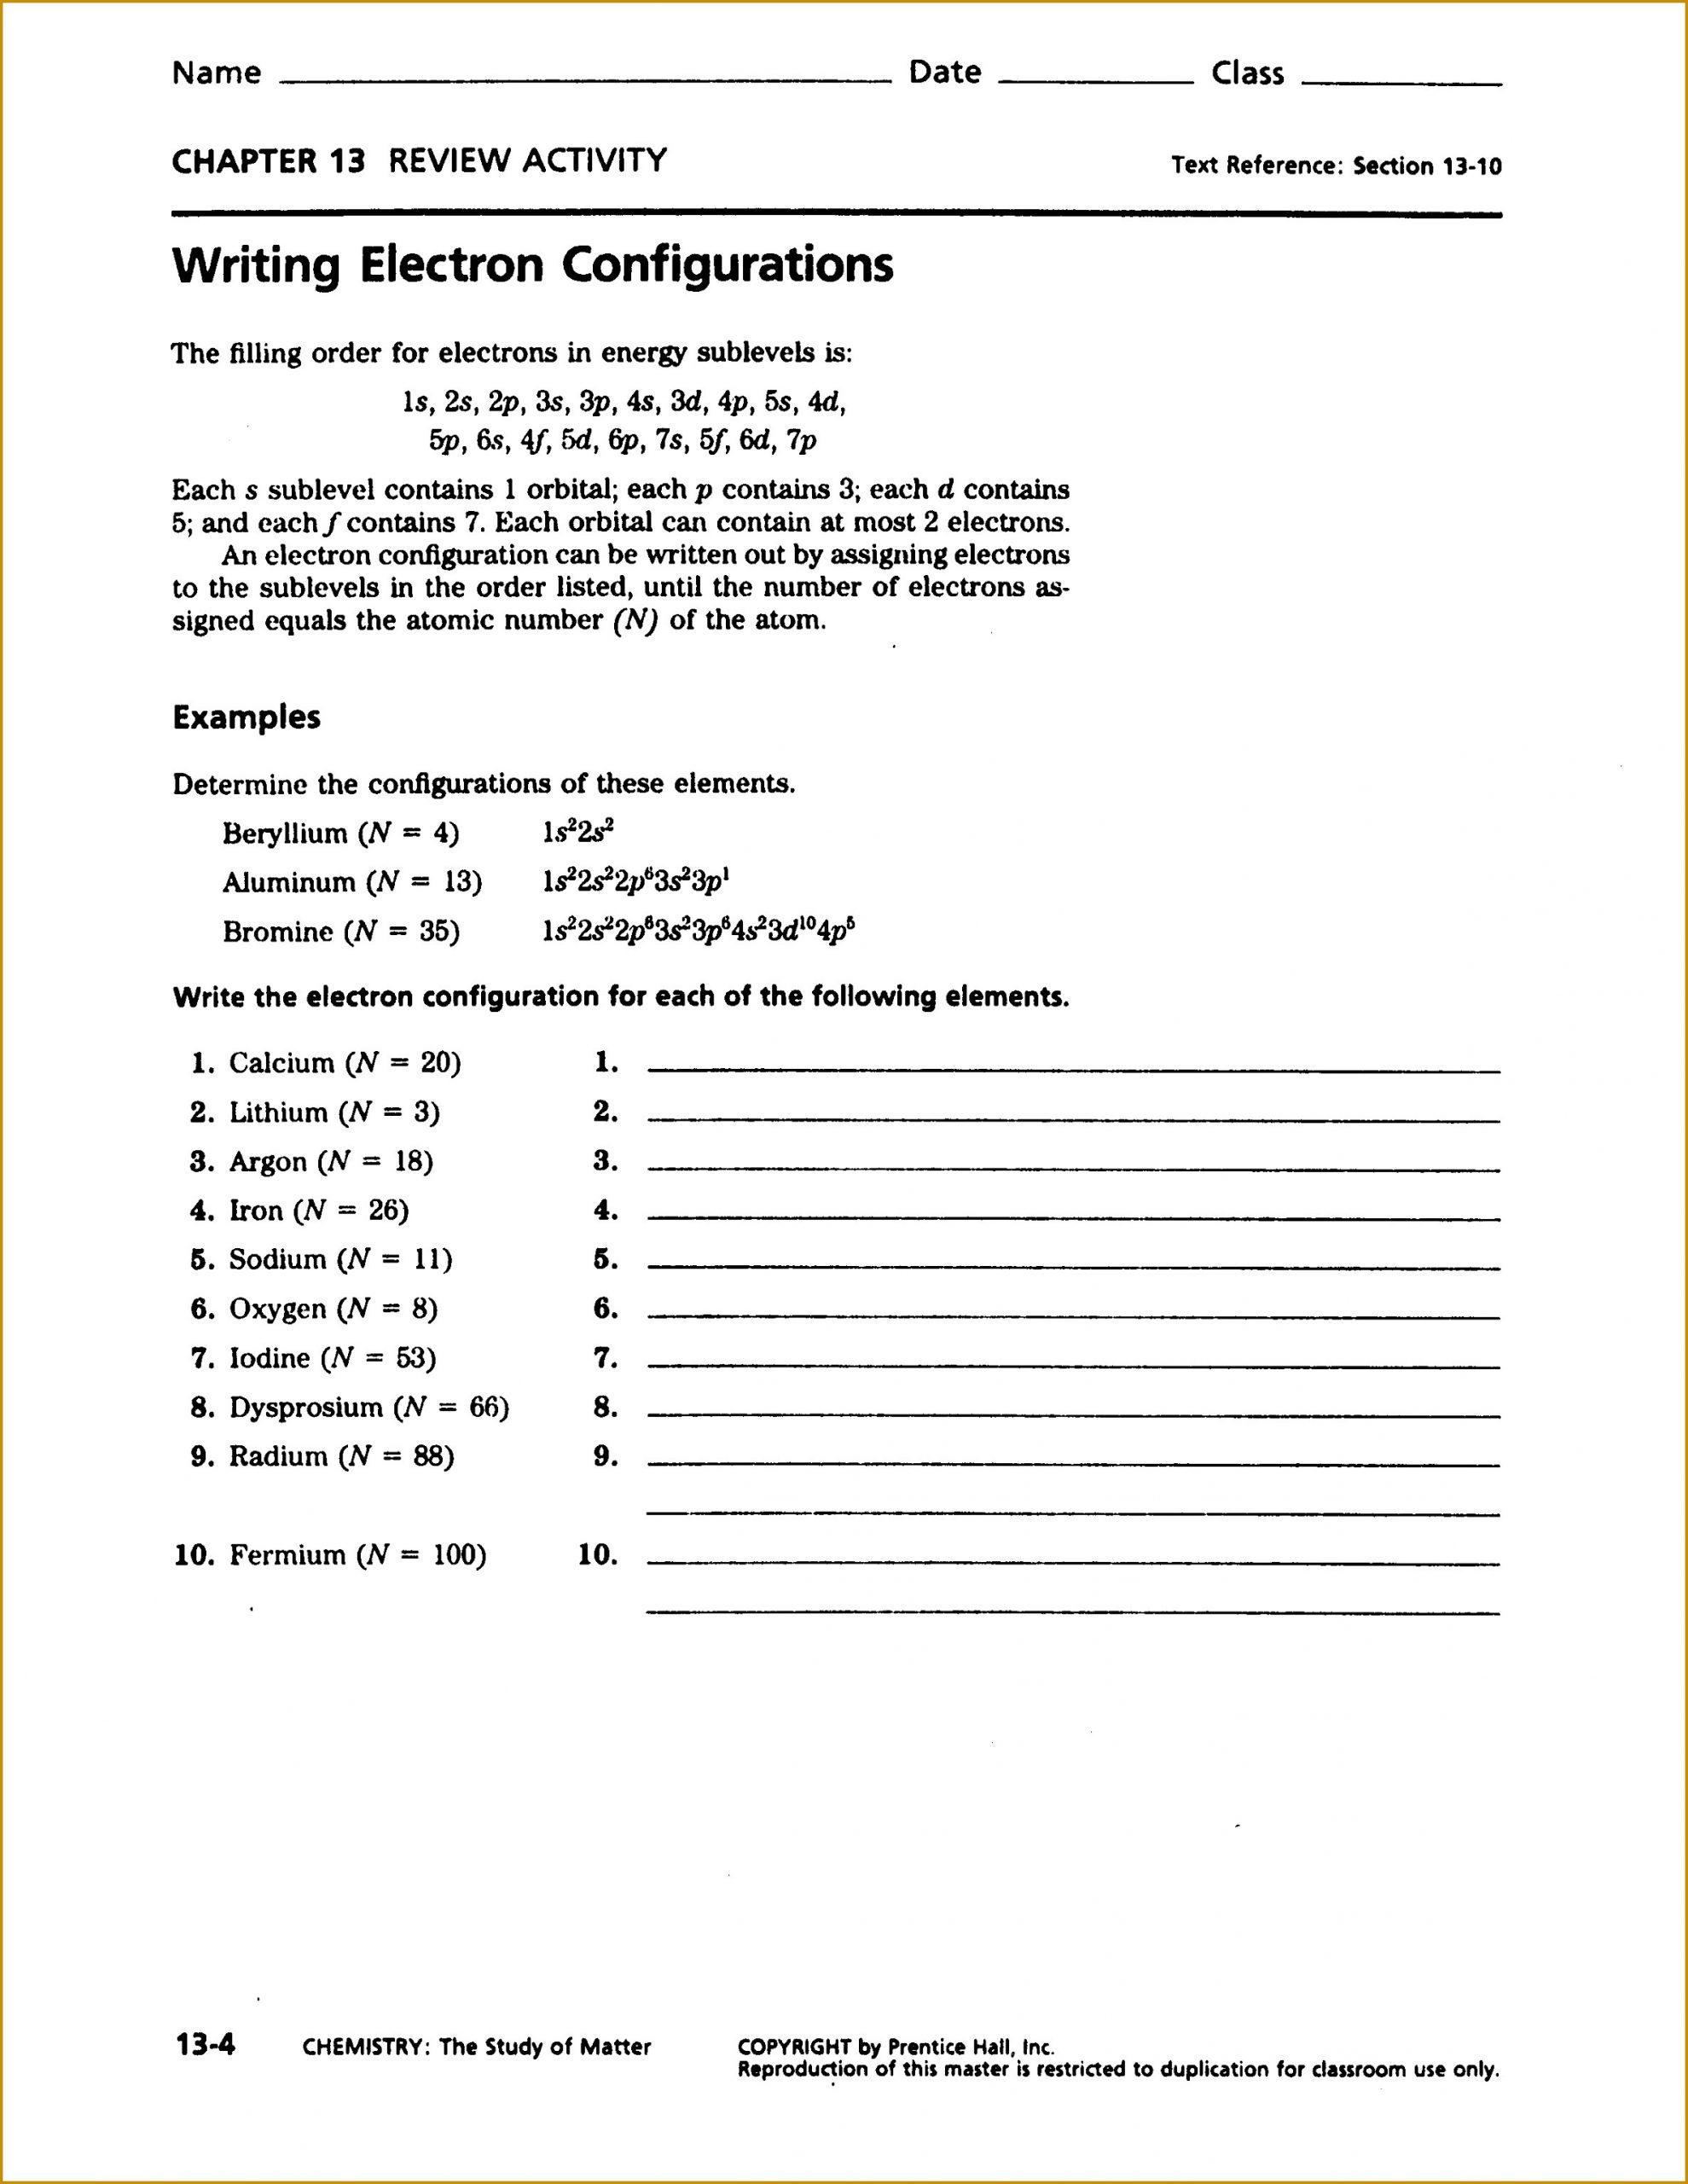 Basic atomic Structure Worksheet Answers Chapter 4 atomic Structure Worksheet Answers